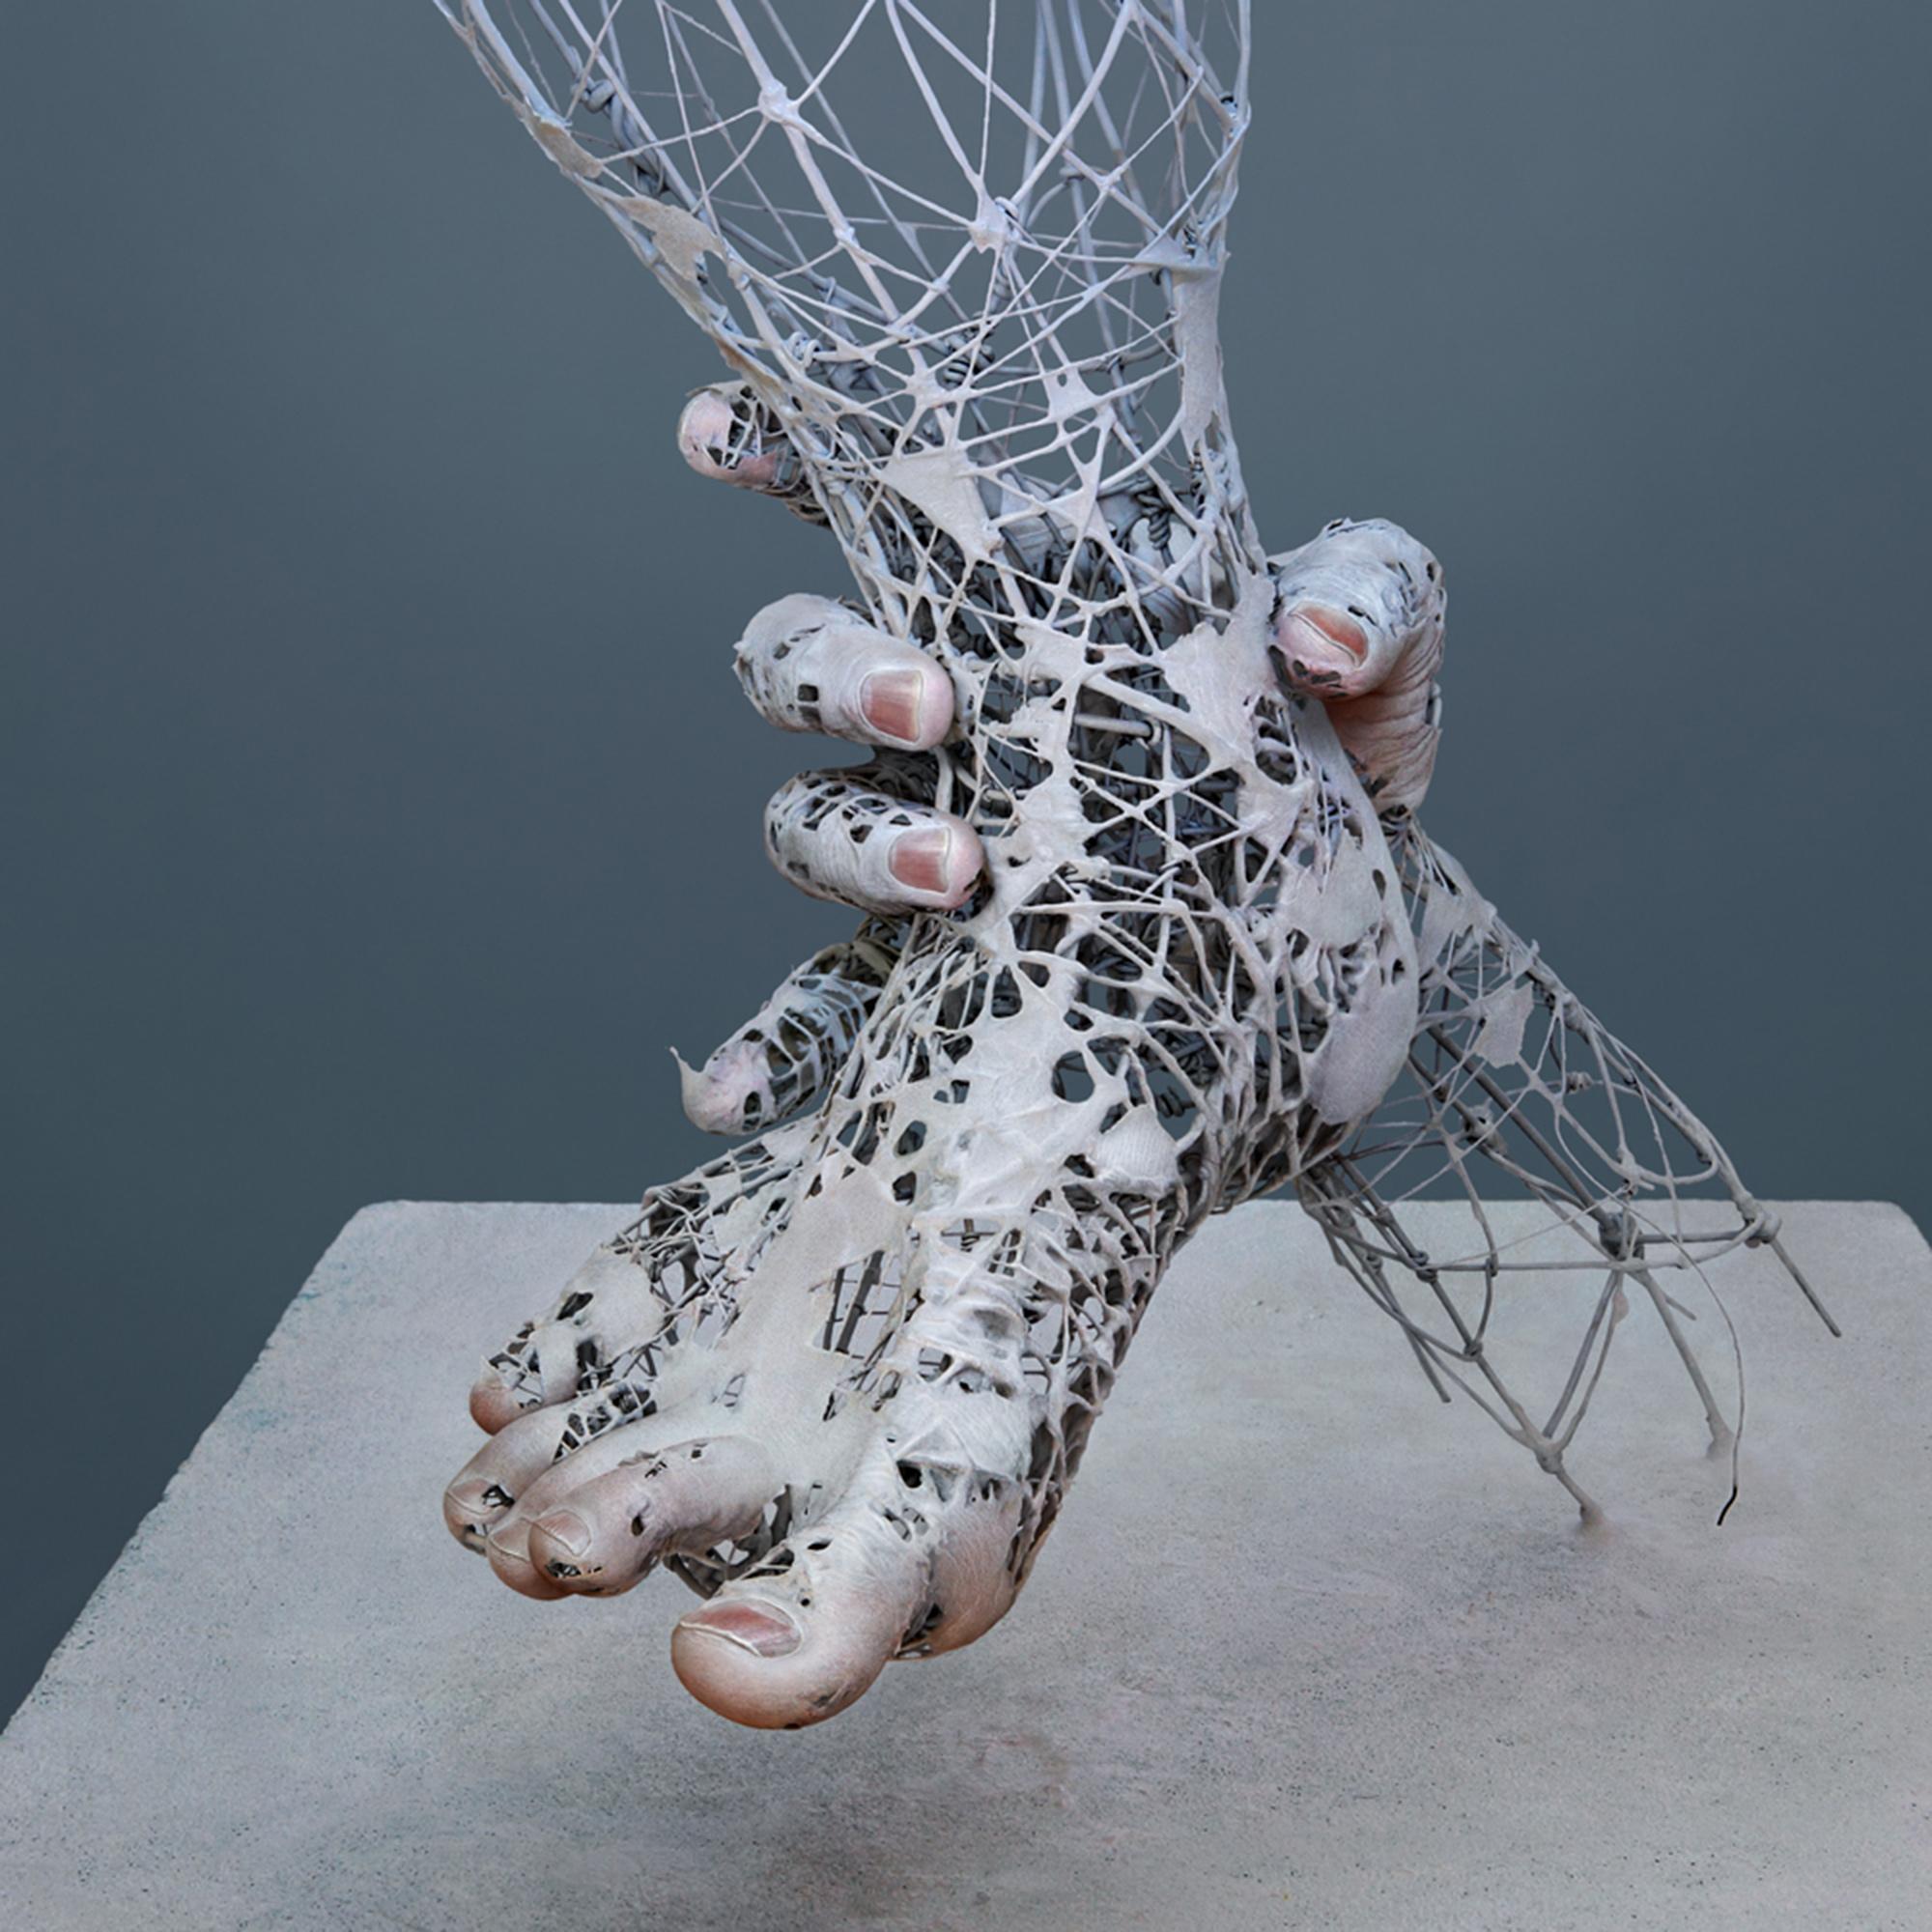 Eerie, Disintegrating Bodies by Yuichi Ikehata